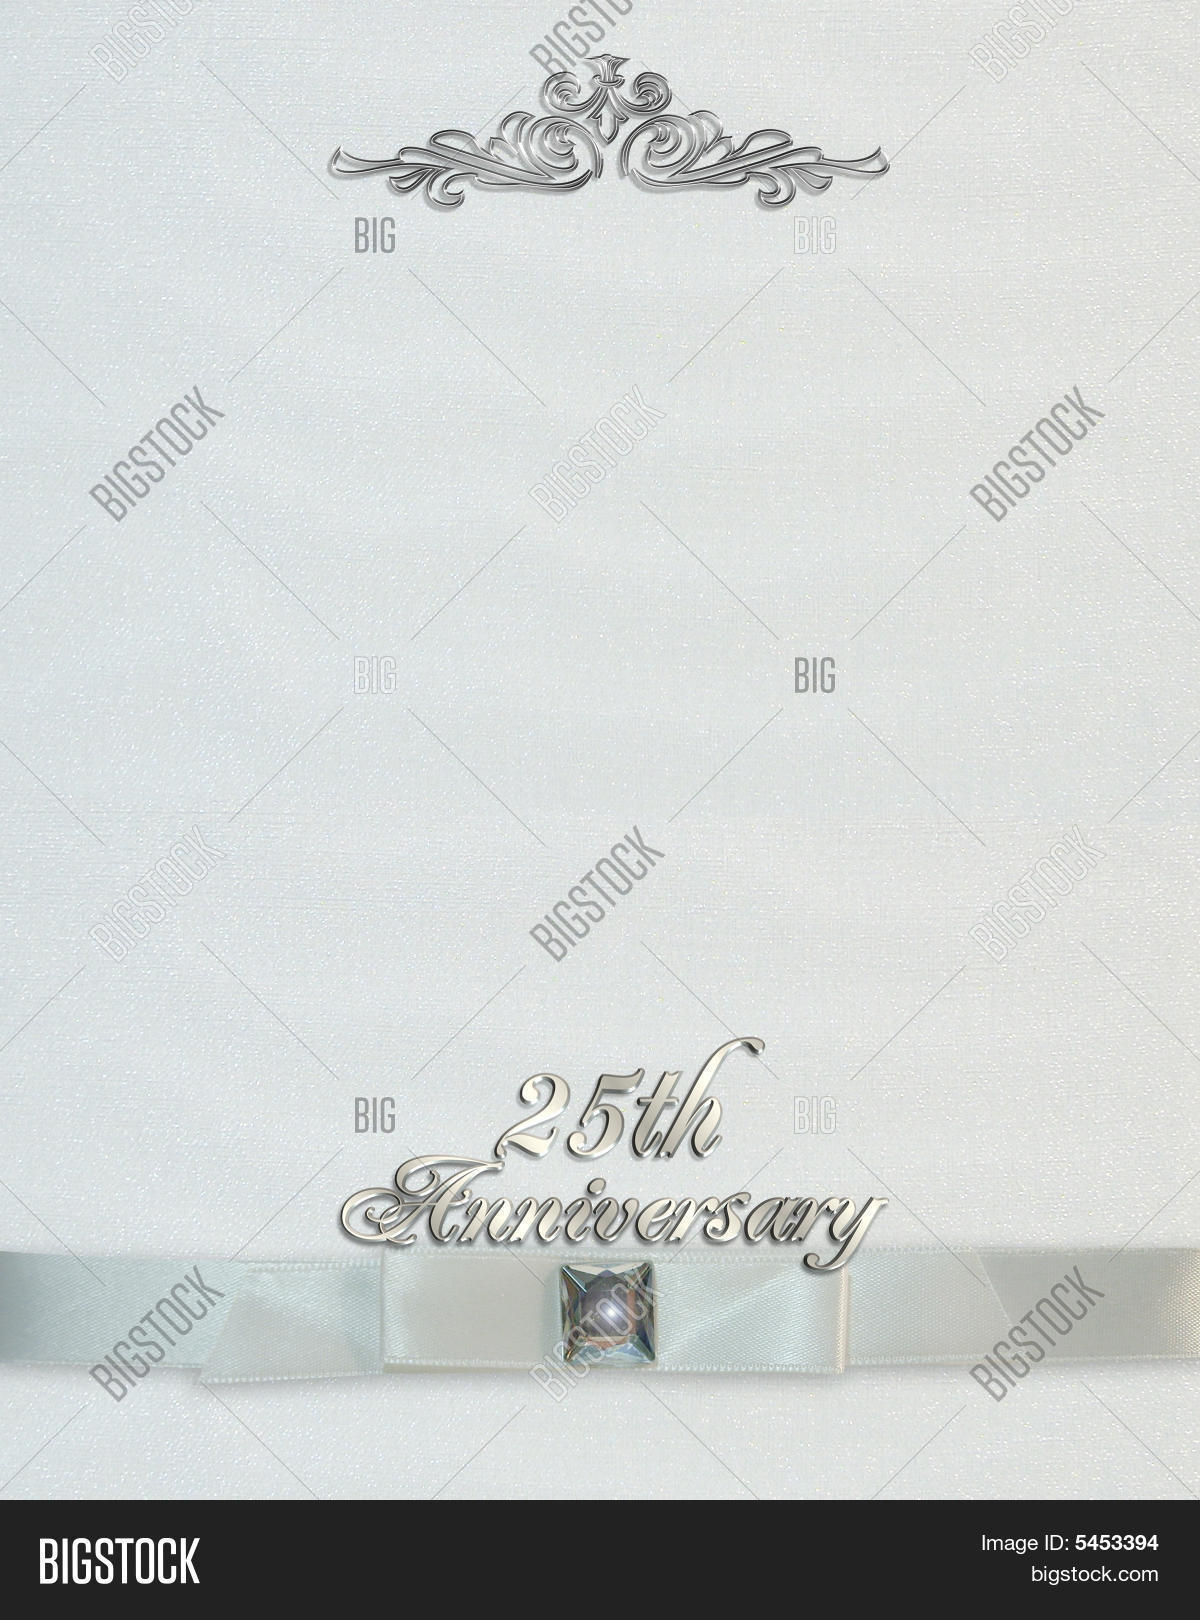 25th wedding image photo free trial bigstock 25th wedding anniversary invitation background stopboris Gallery